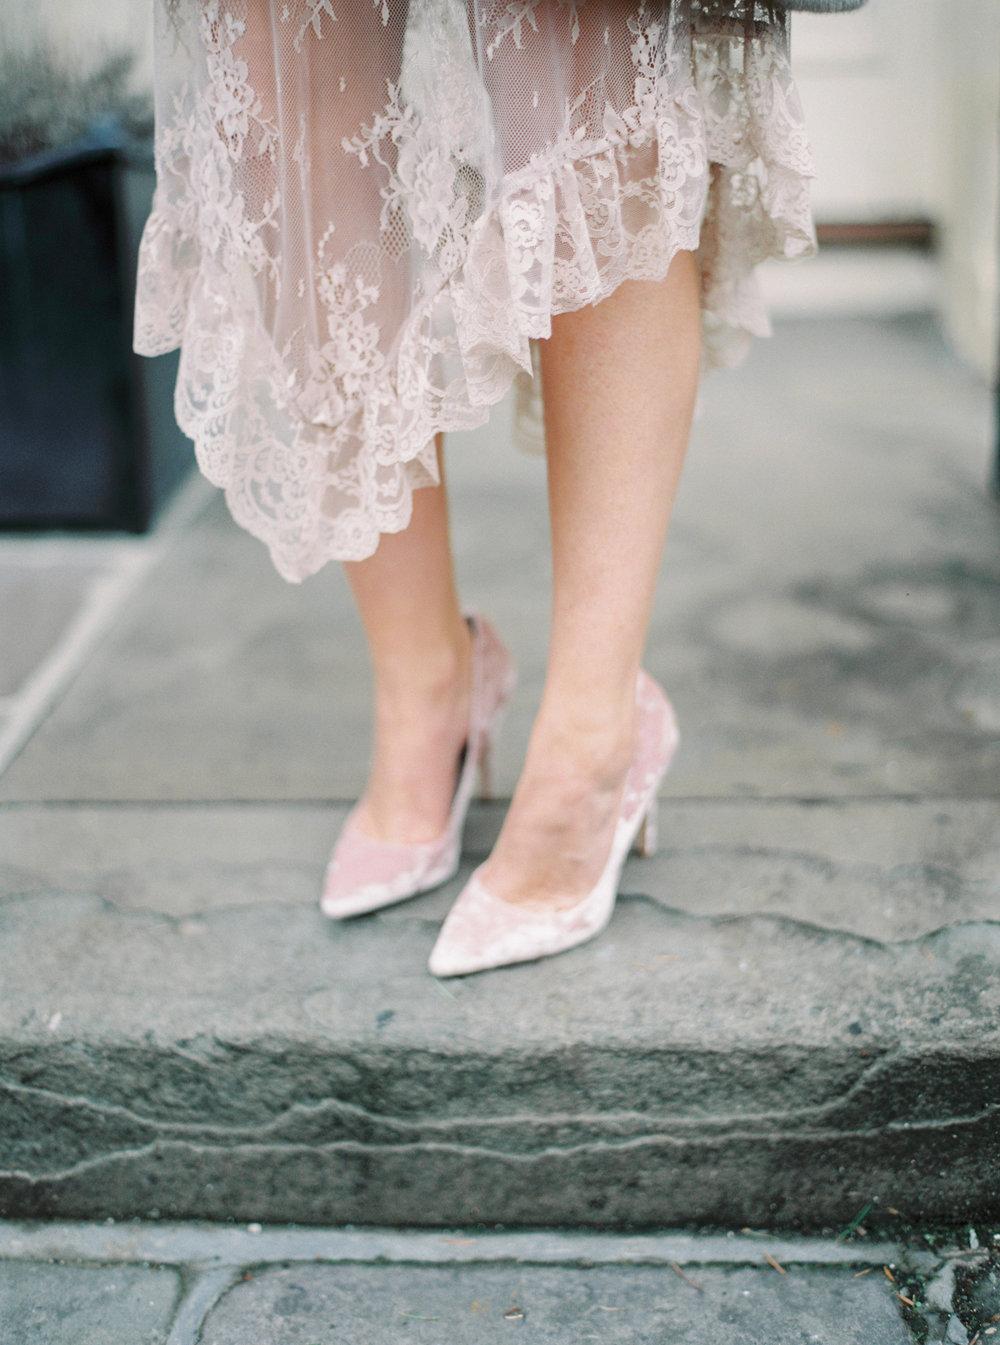 Luxury Wedding Planner UK | Our Chic & Romantic Engagement Shoot in Bath | Katie Julia Photography - 40.JPG